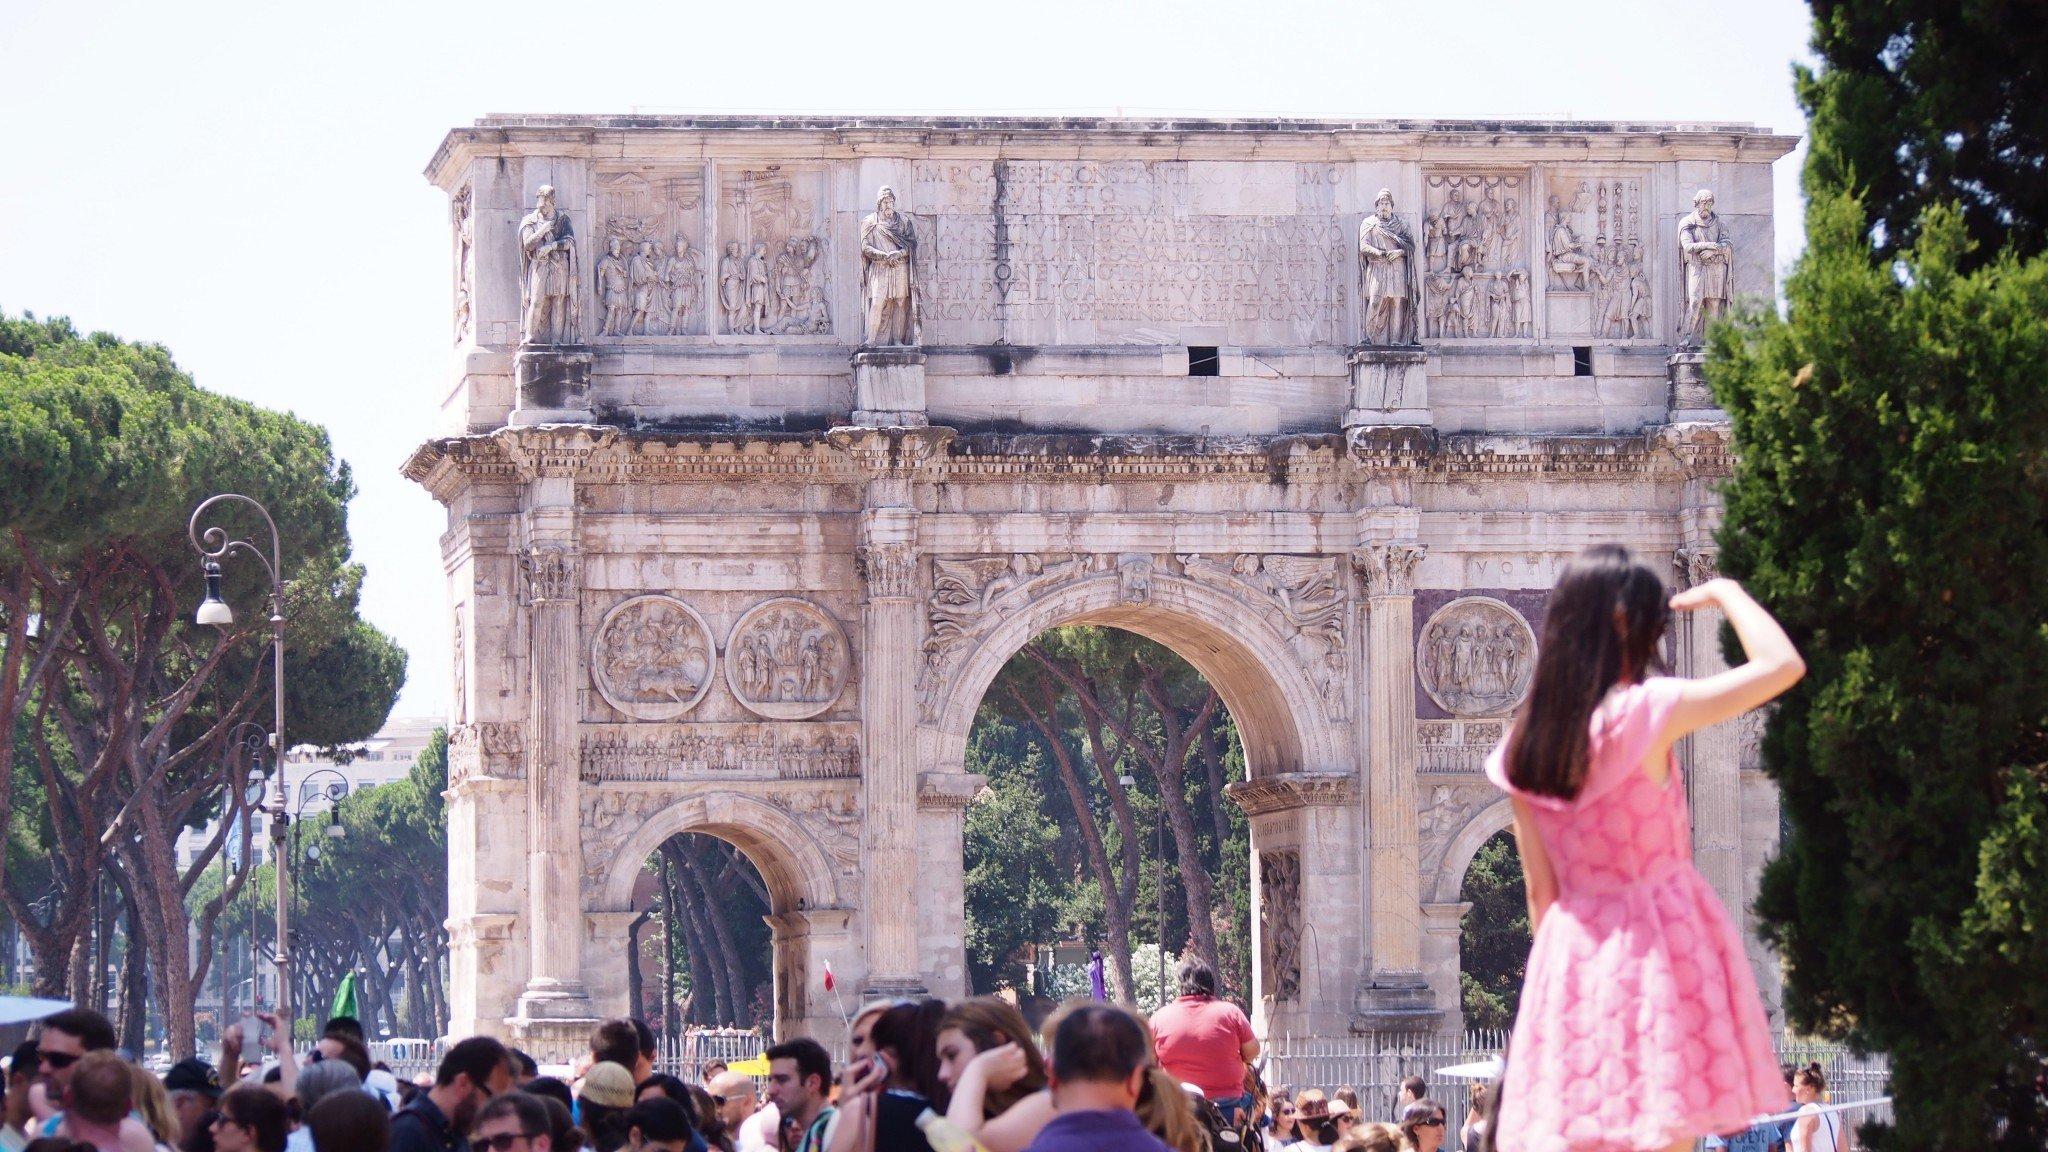 Riemukaari Colosseum